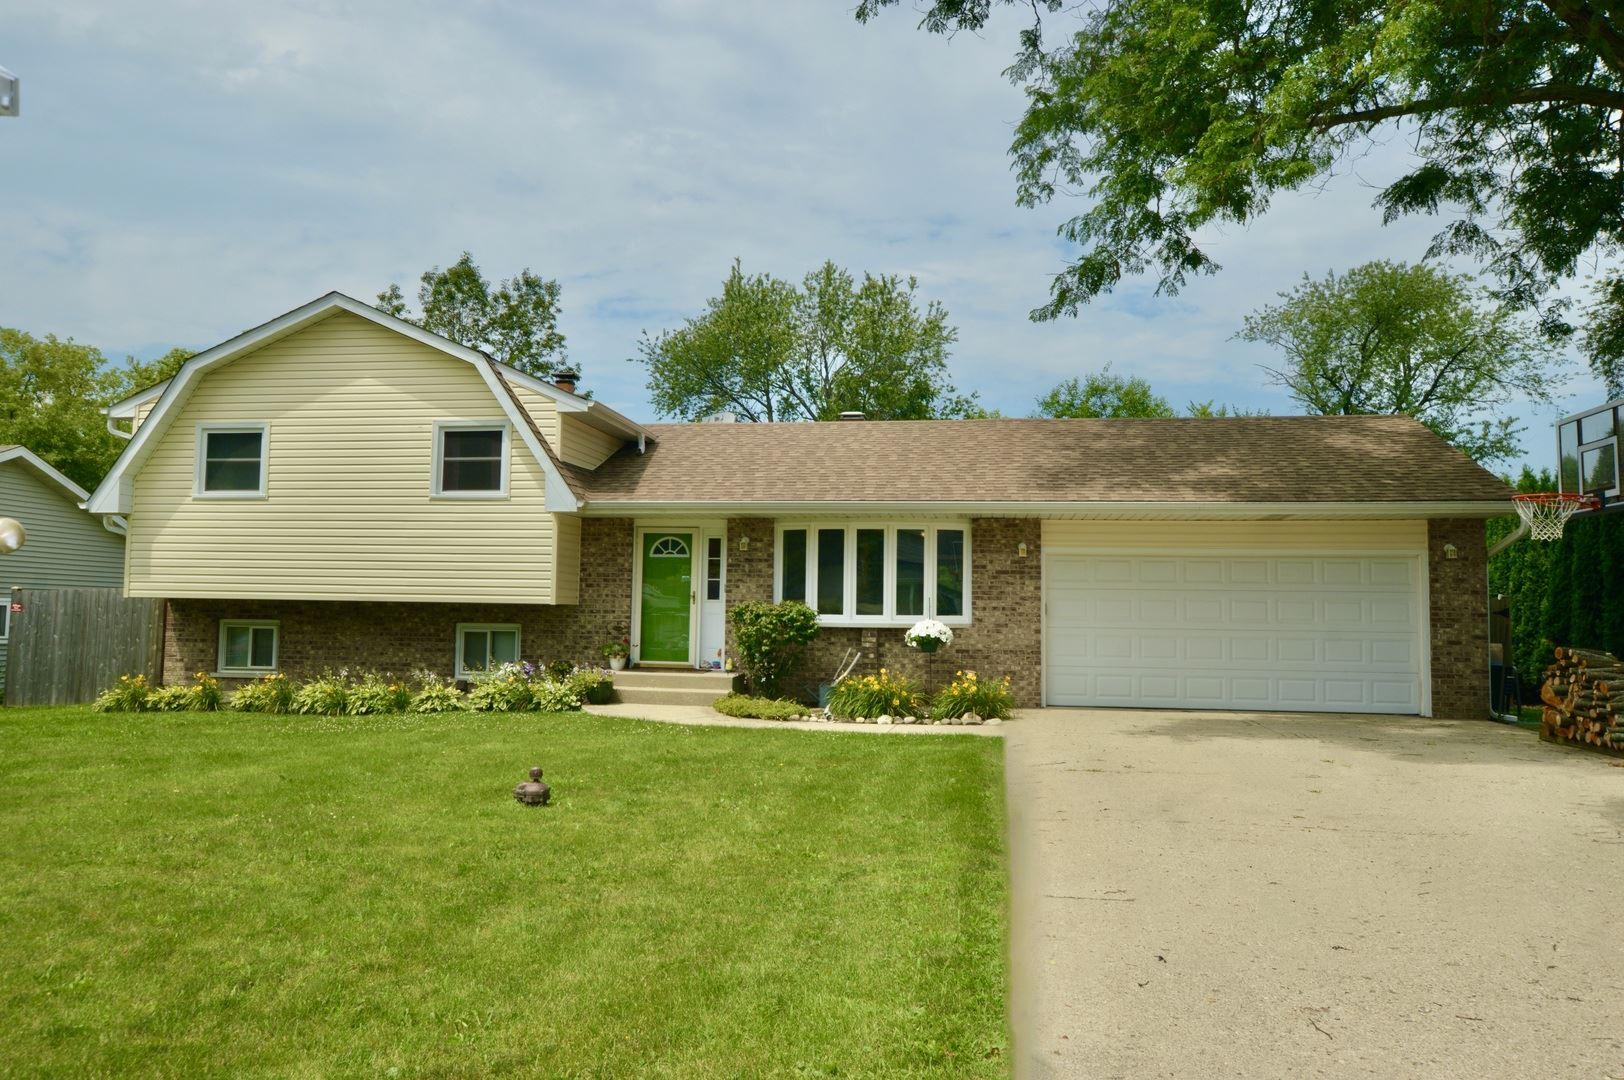 7608 W Andrea Lane, Crystal Lake, IL 60012 - #: 10774728